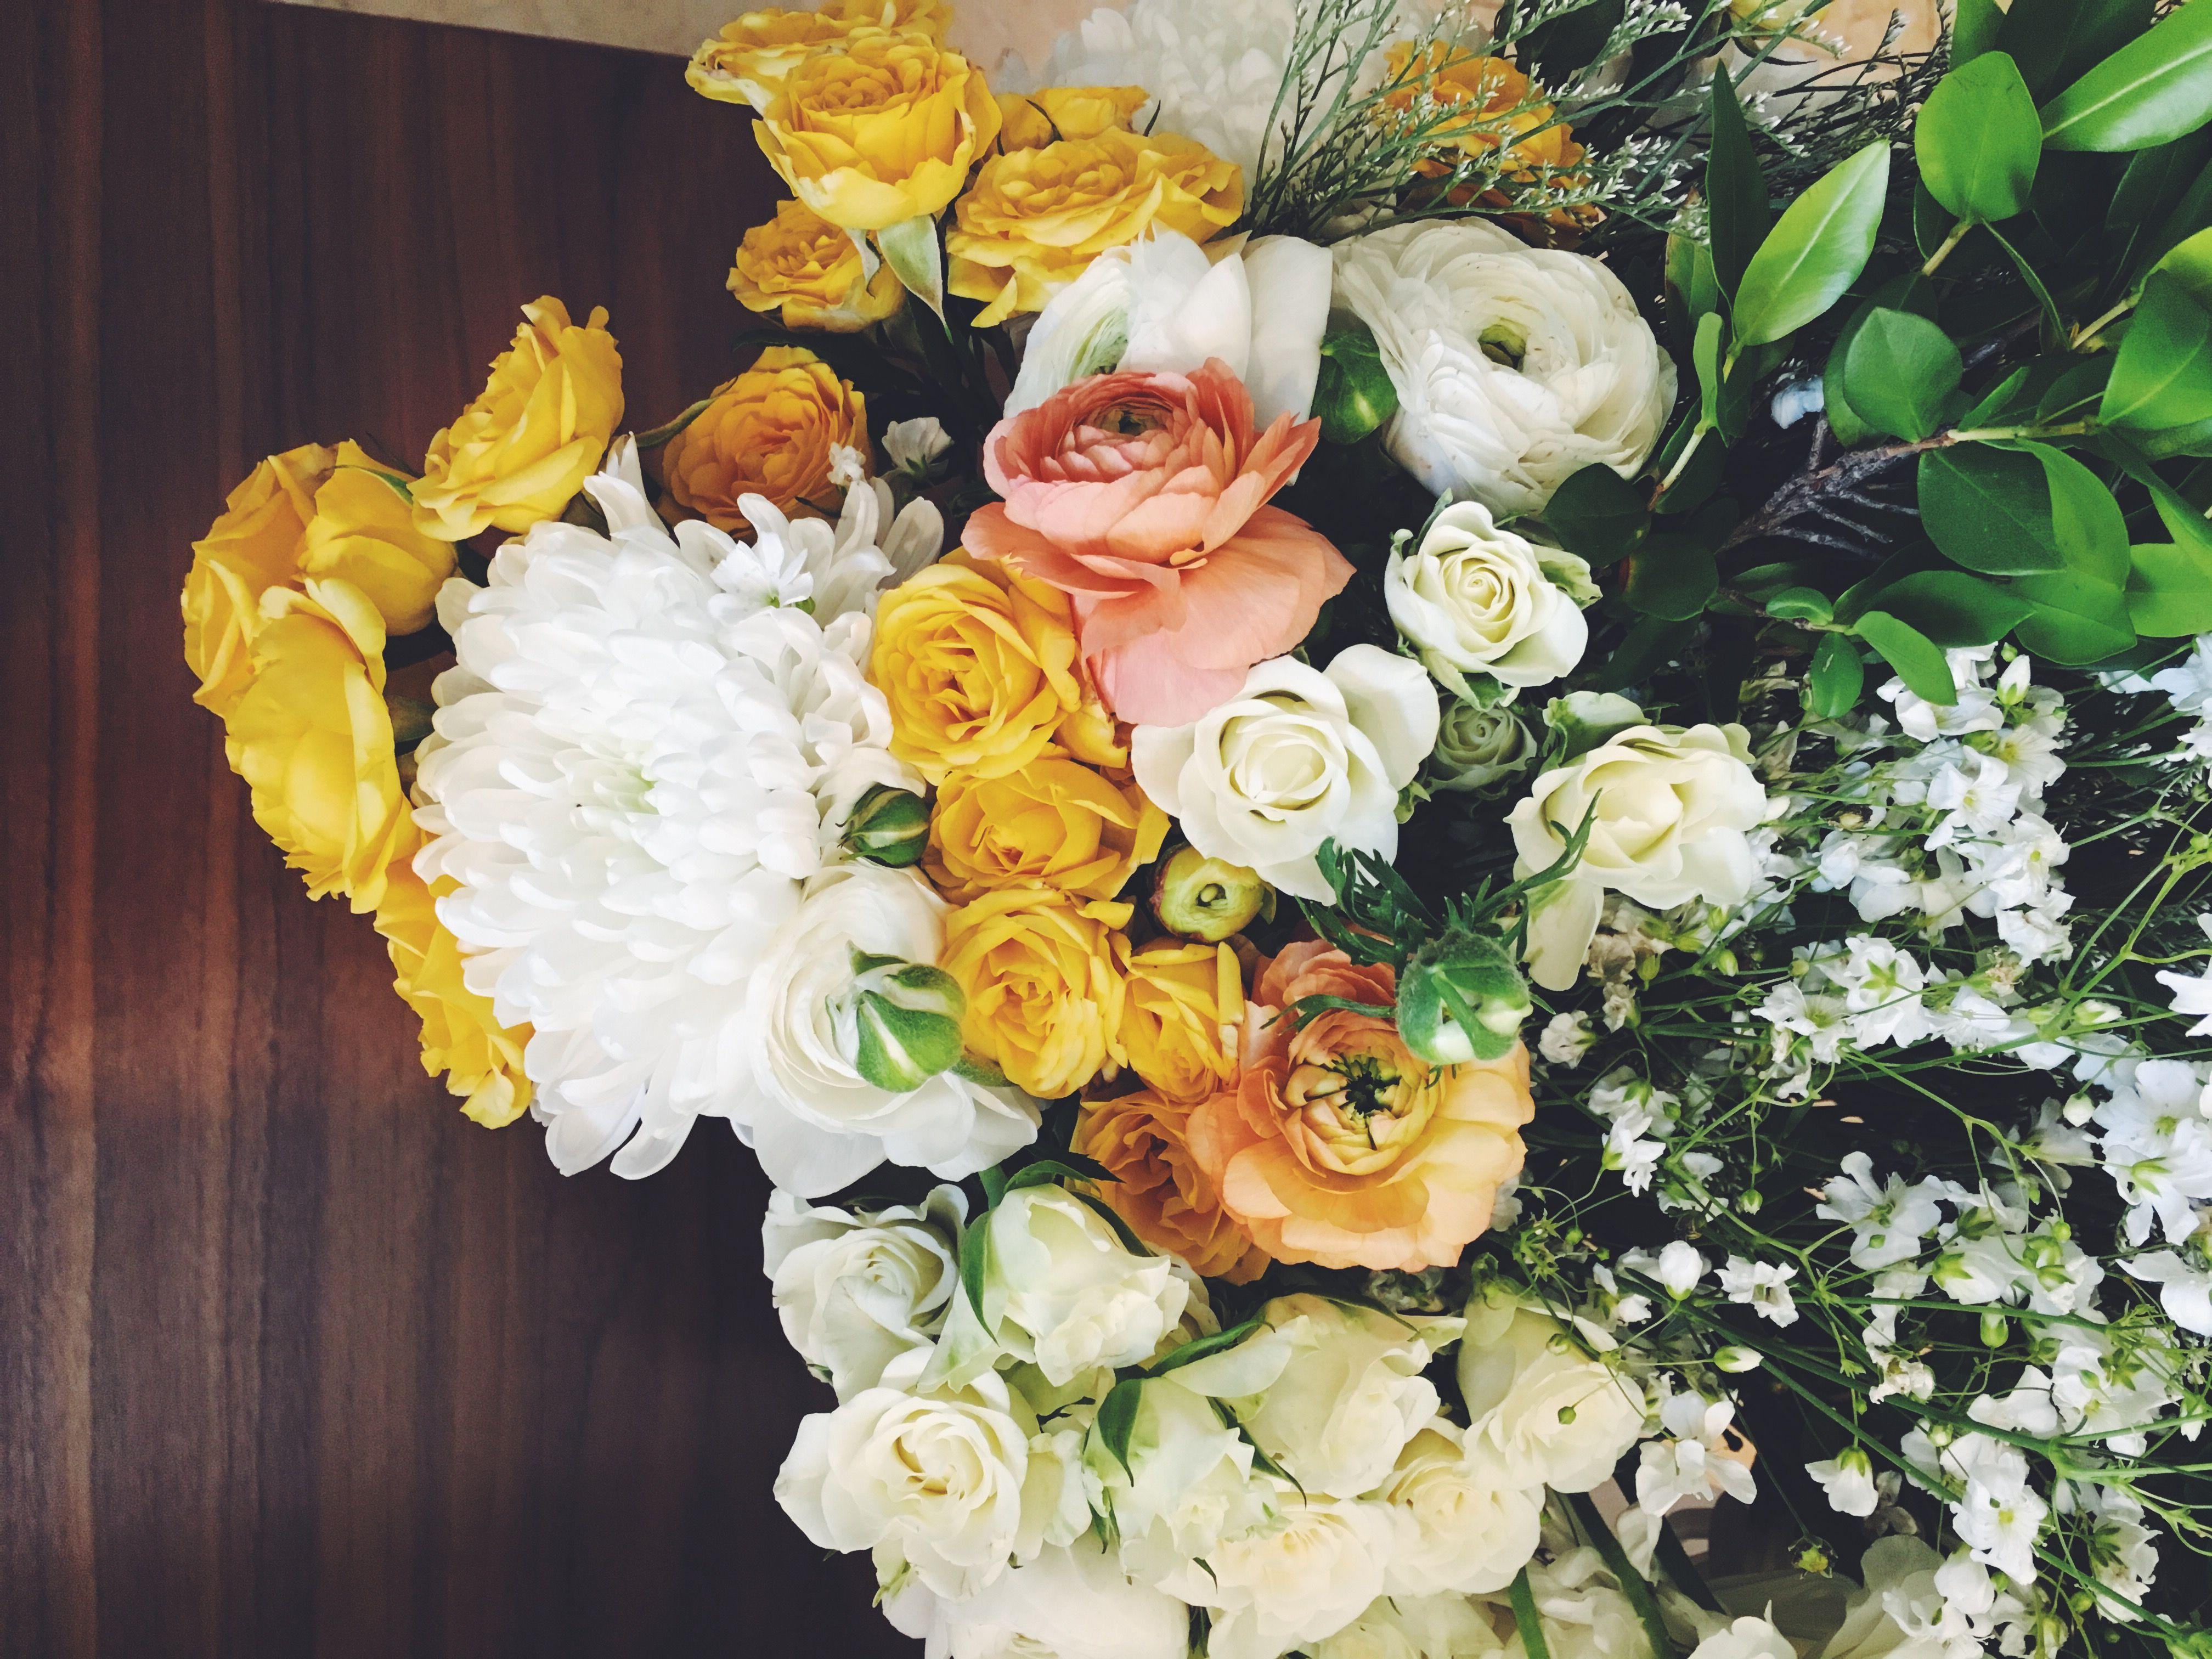 UP CLOSE YELLOW ORANGE & WHITE FLOWERS White flowers